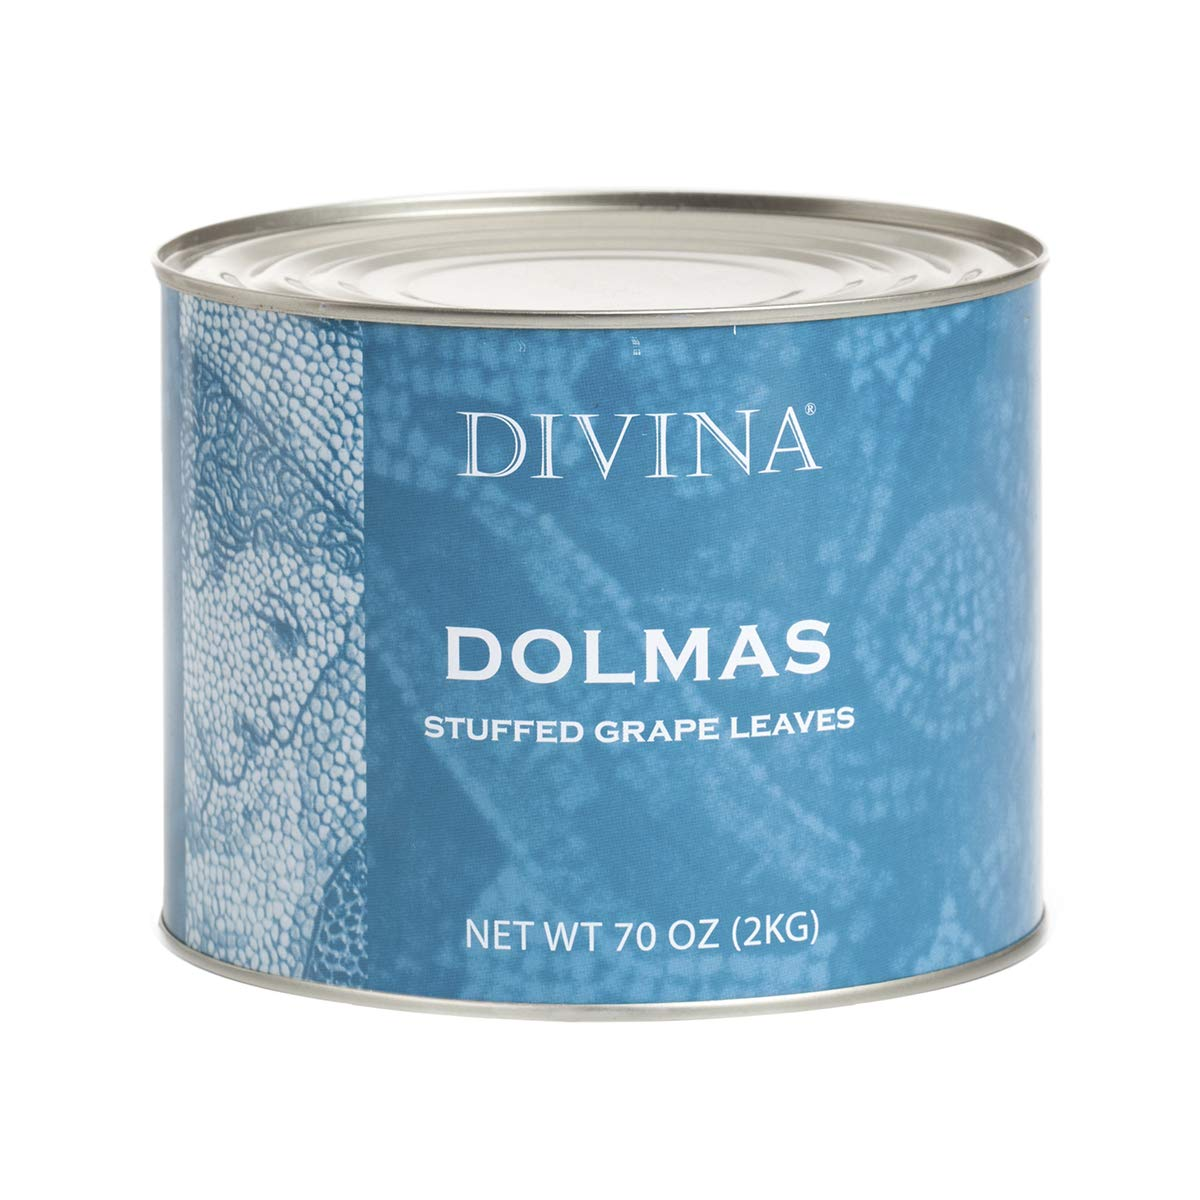 Divina Dolmas Stuffed Grape Leaves, 4.4 Lb. Can by Divina